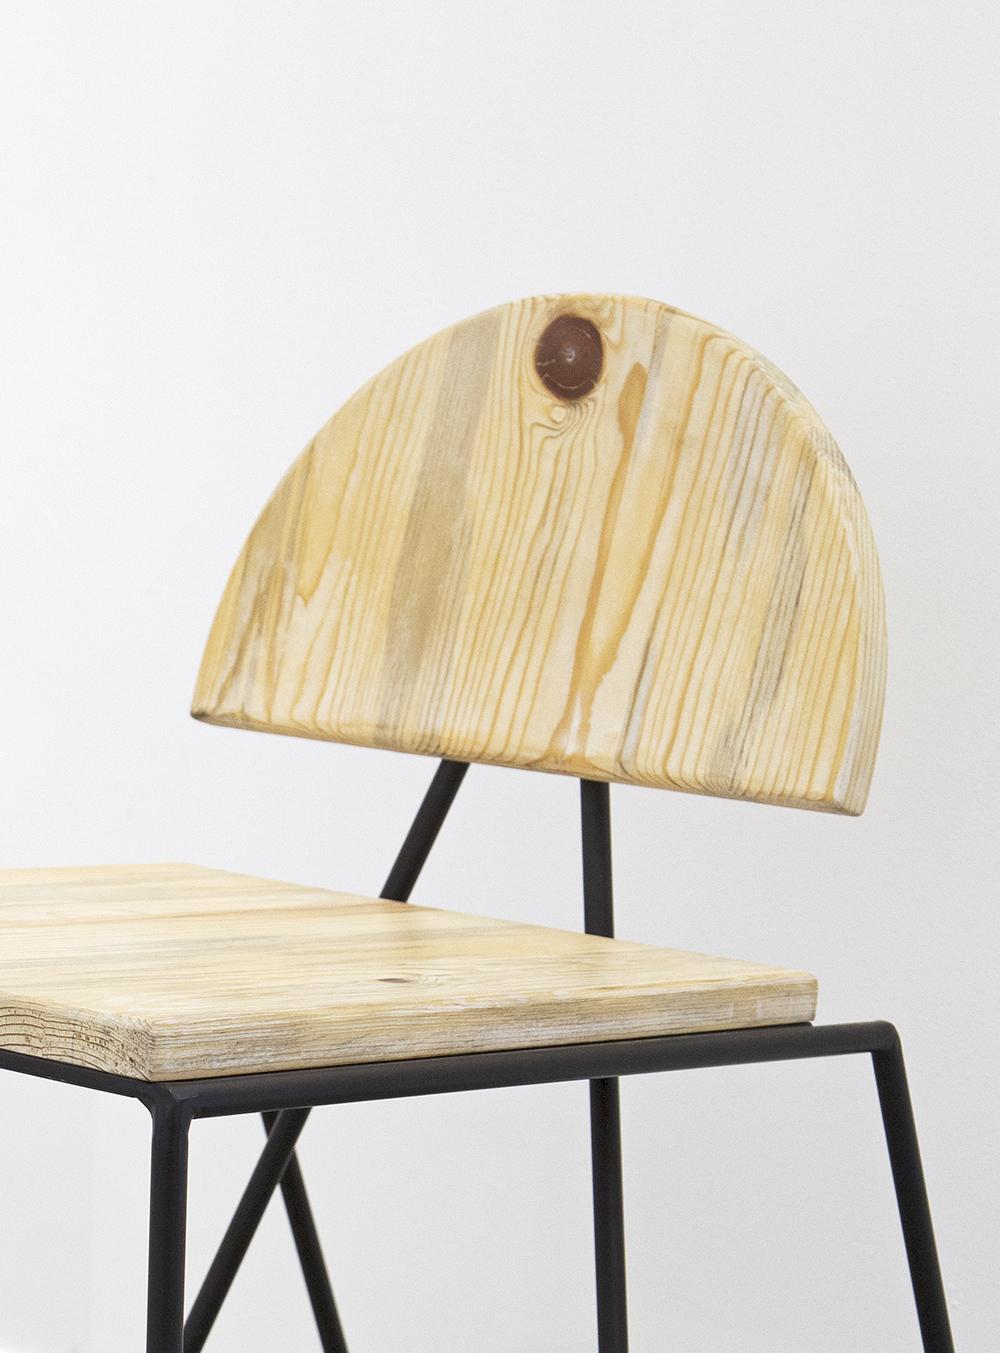 trent_dean_public_land_store_sacramento_chair_detail.jpg